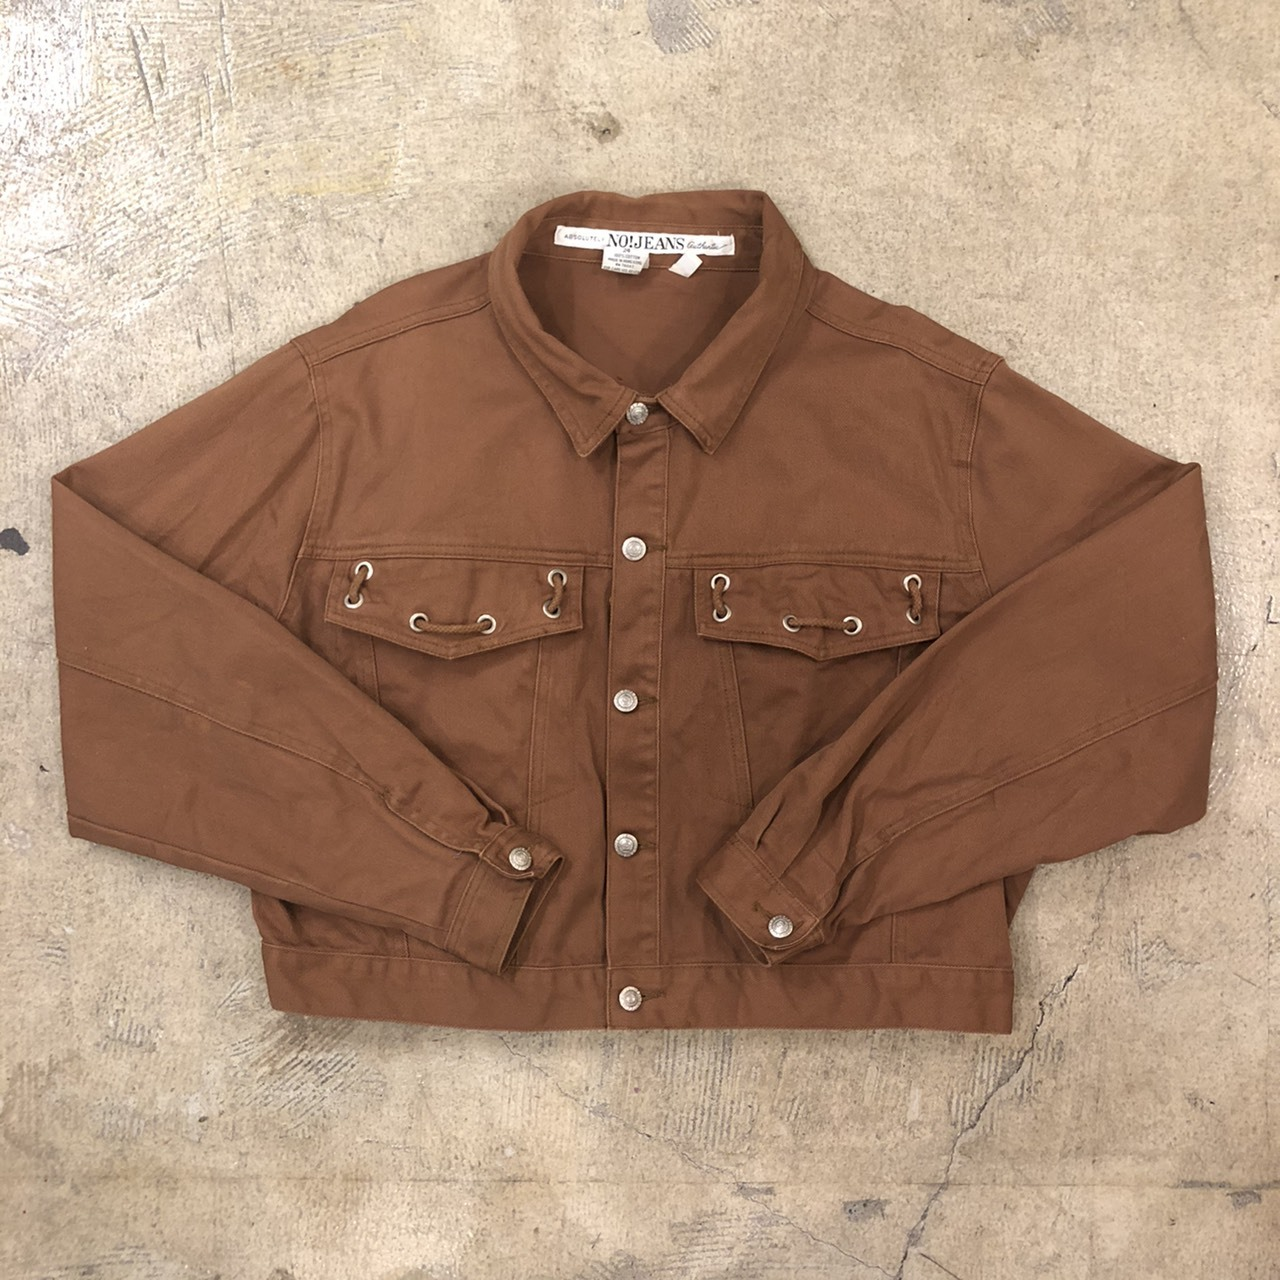 80's Fashion Jacket ¥5,900+tax